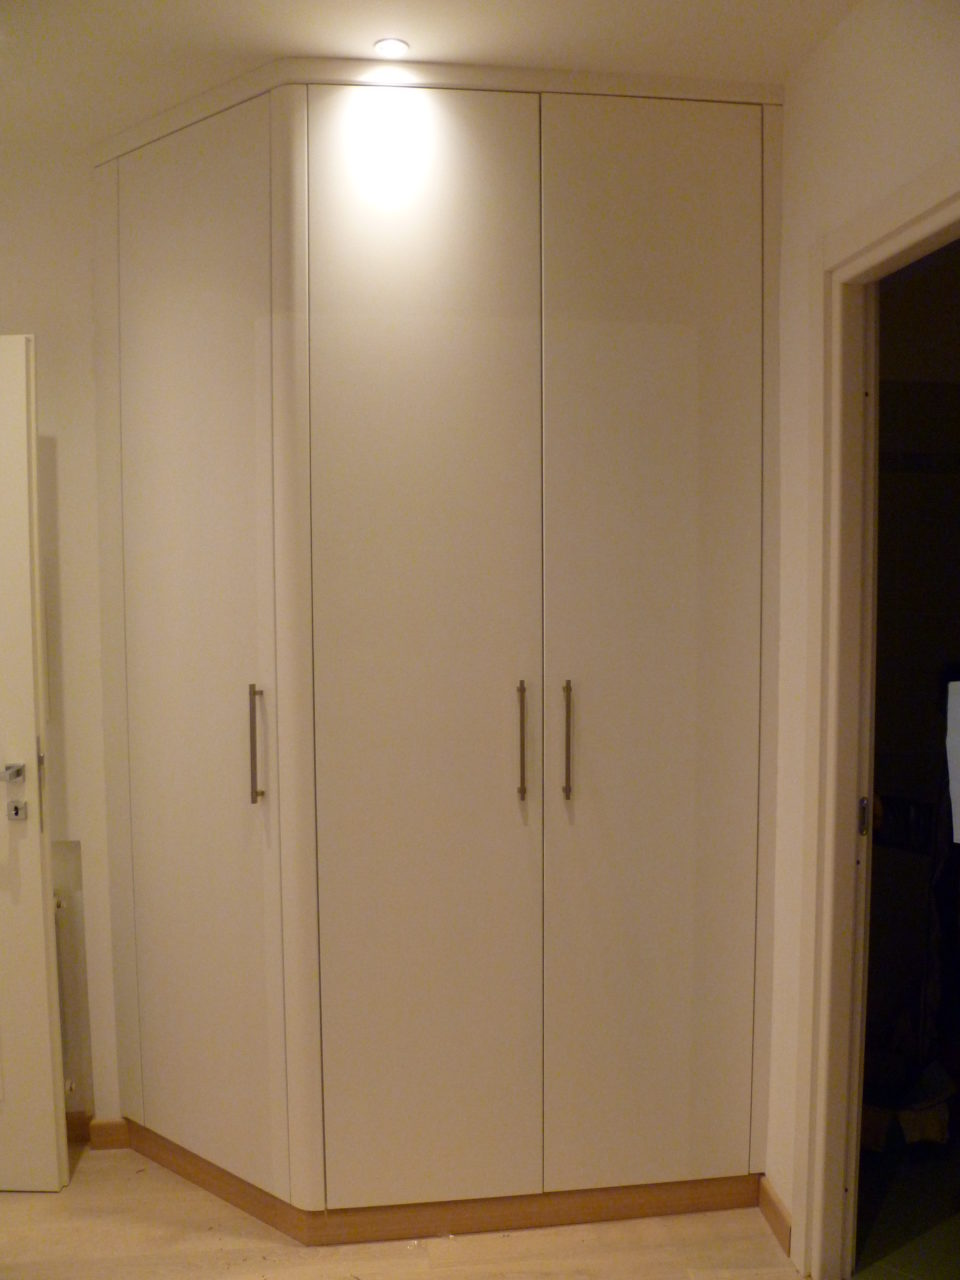 Emejing ante armadio a muro ideas - Ikea armadi a muro ...